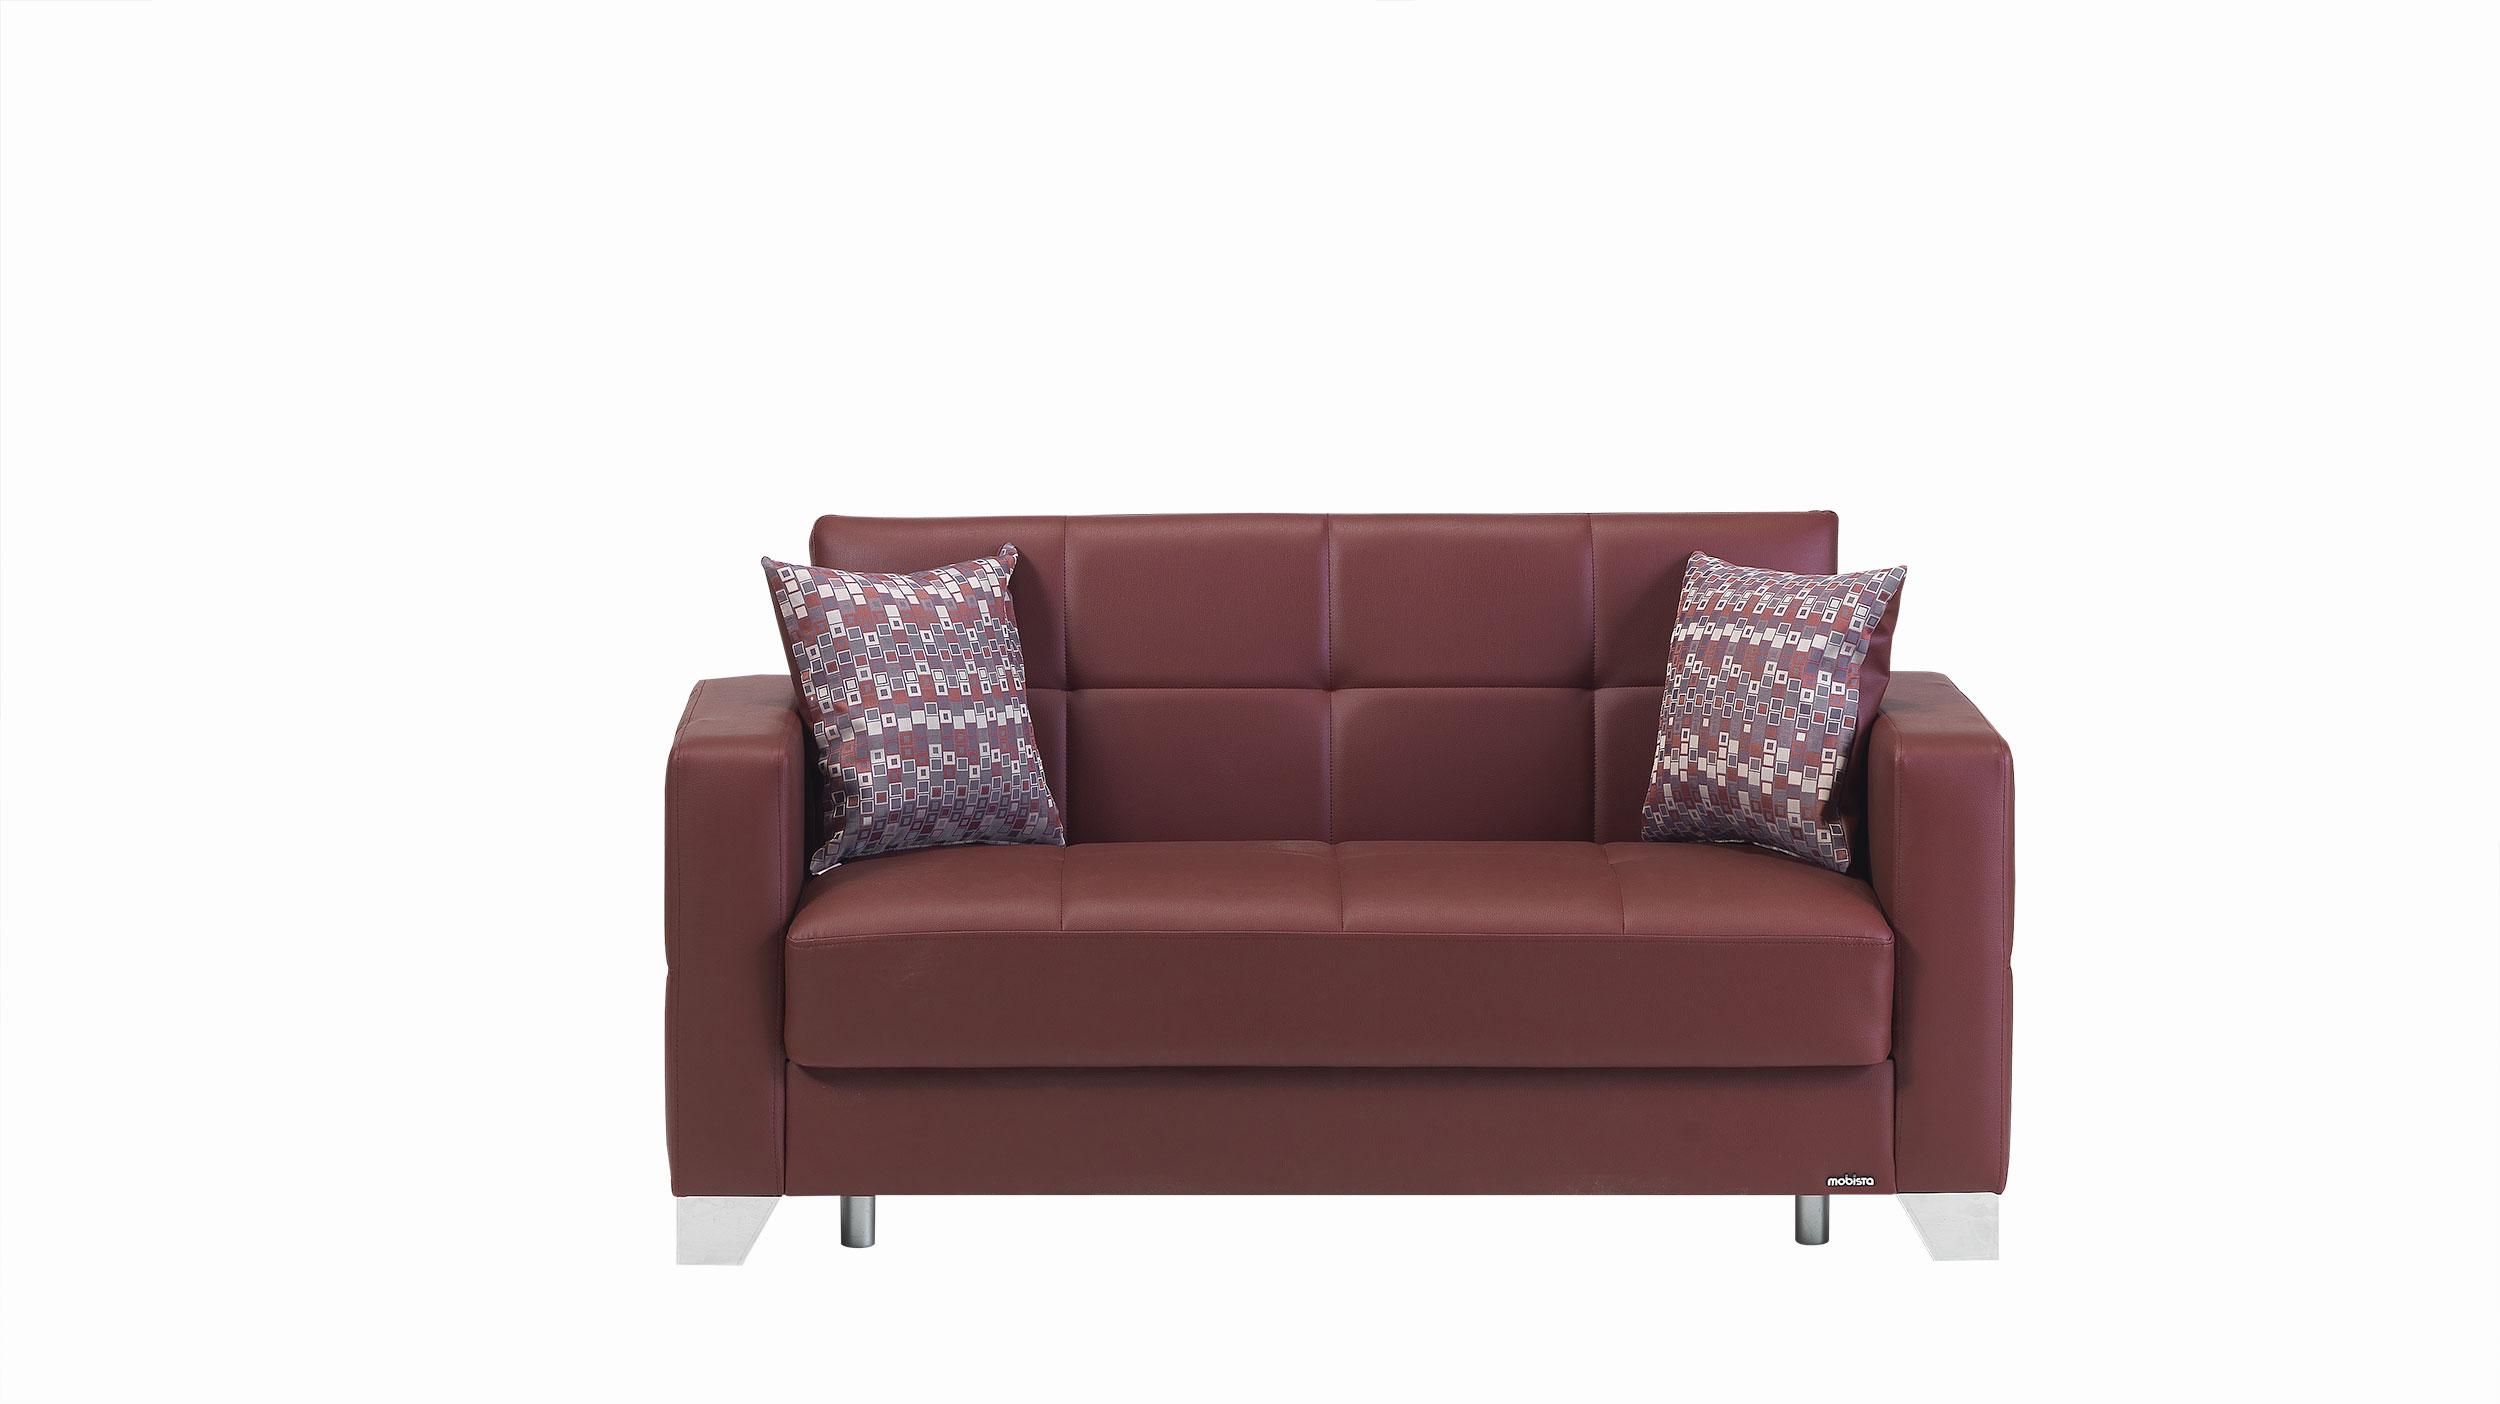 leatherette sofa durability gaming uk viva italia prestige burgundy loveseat bed by